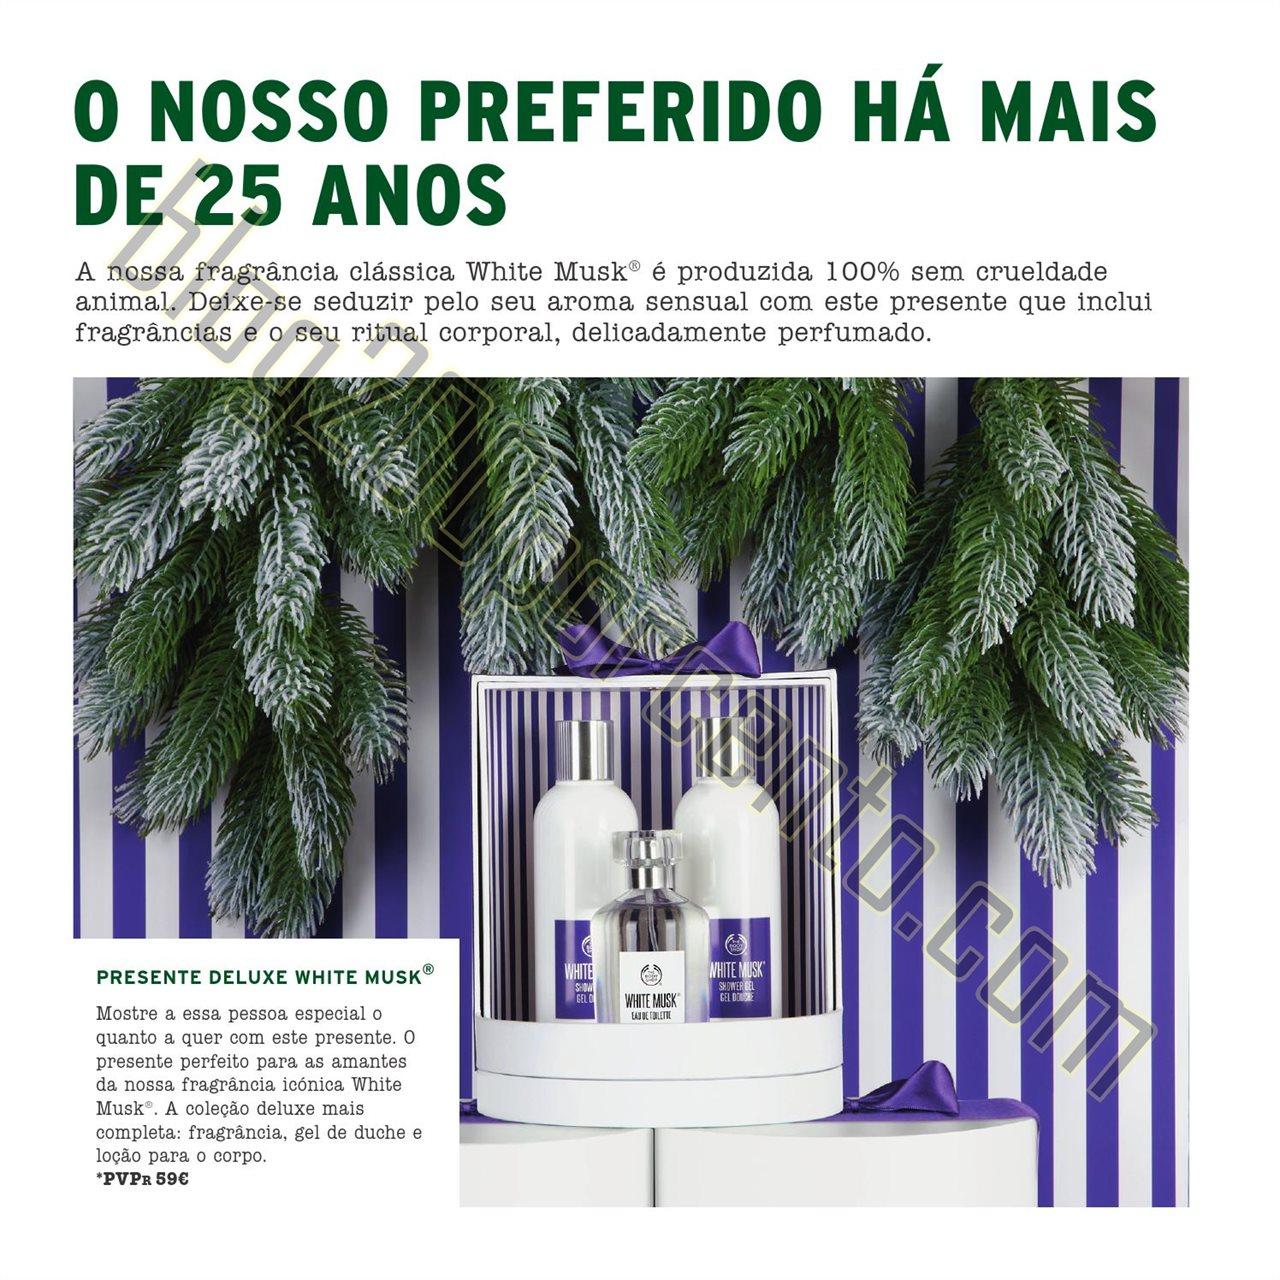 Novo Folheto THE BODY SHOP Natal 2015 p14.jpg